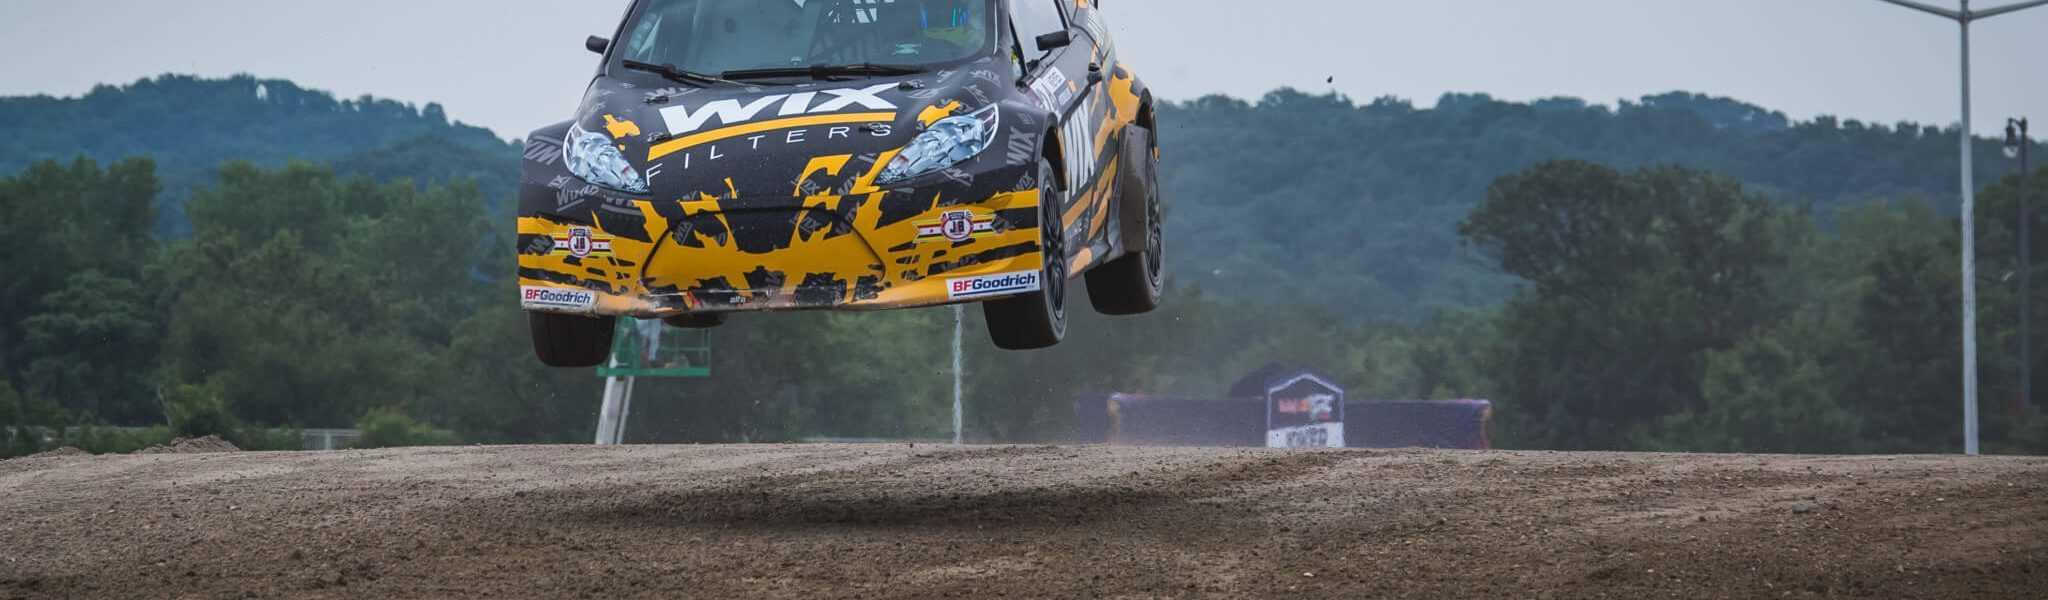 Alex Keyes Winning in the RedBull Global RallyCross Series